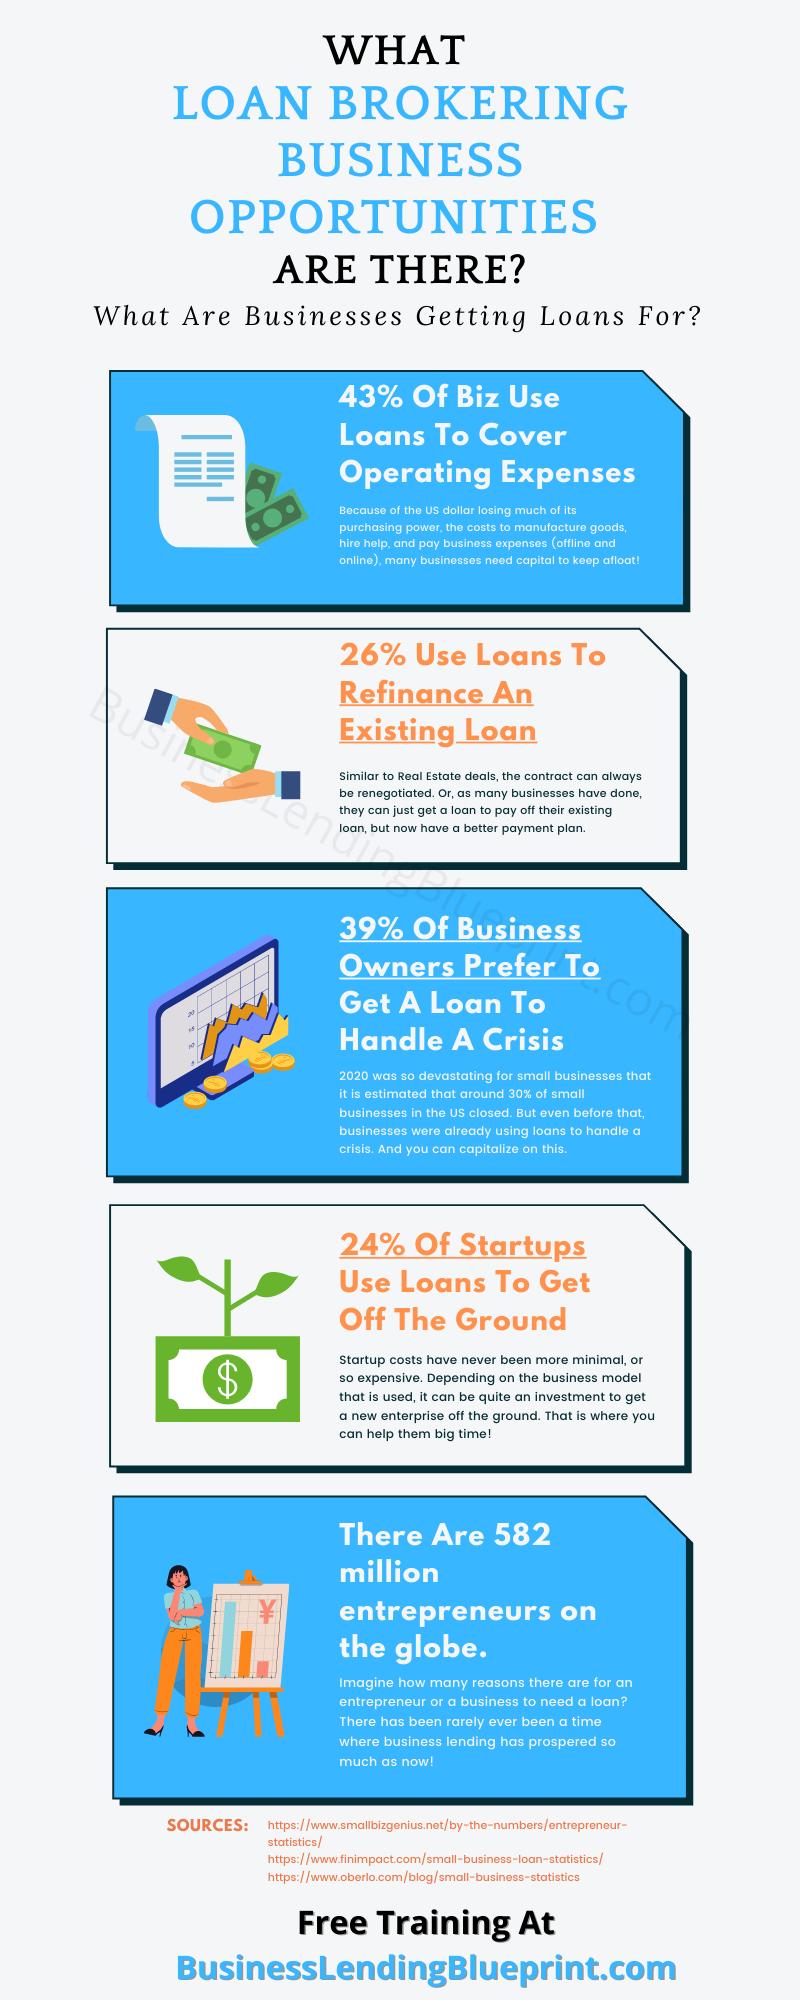 Loan Brokering Business Opportunities Infographic